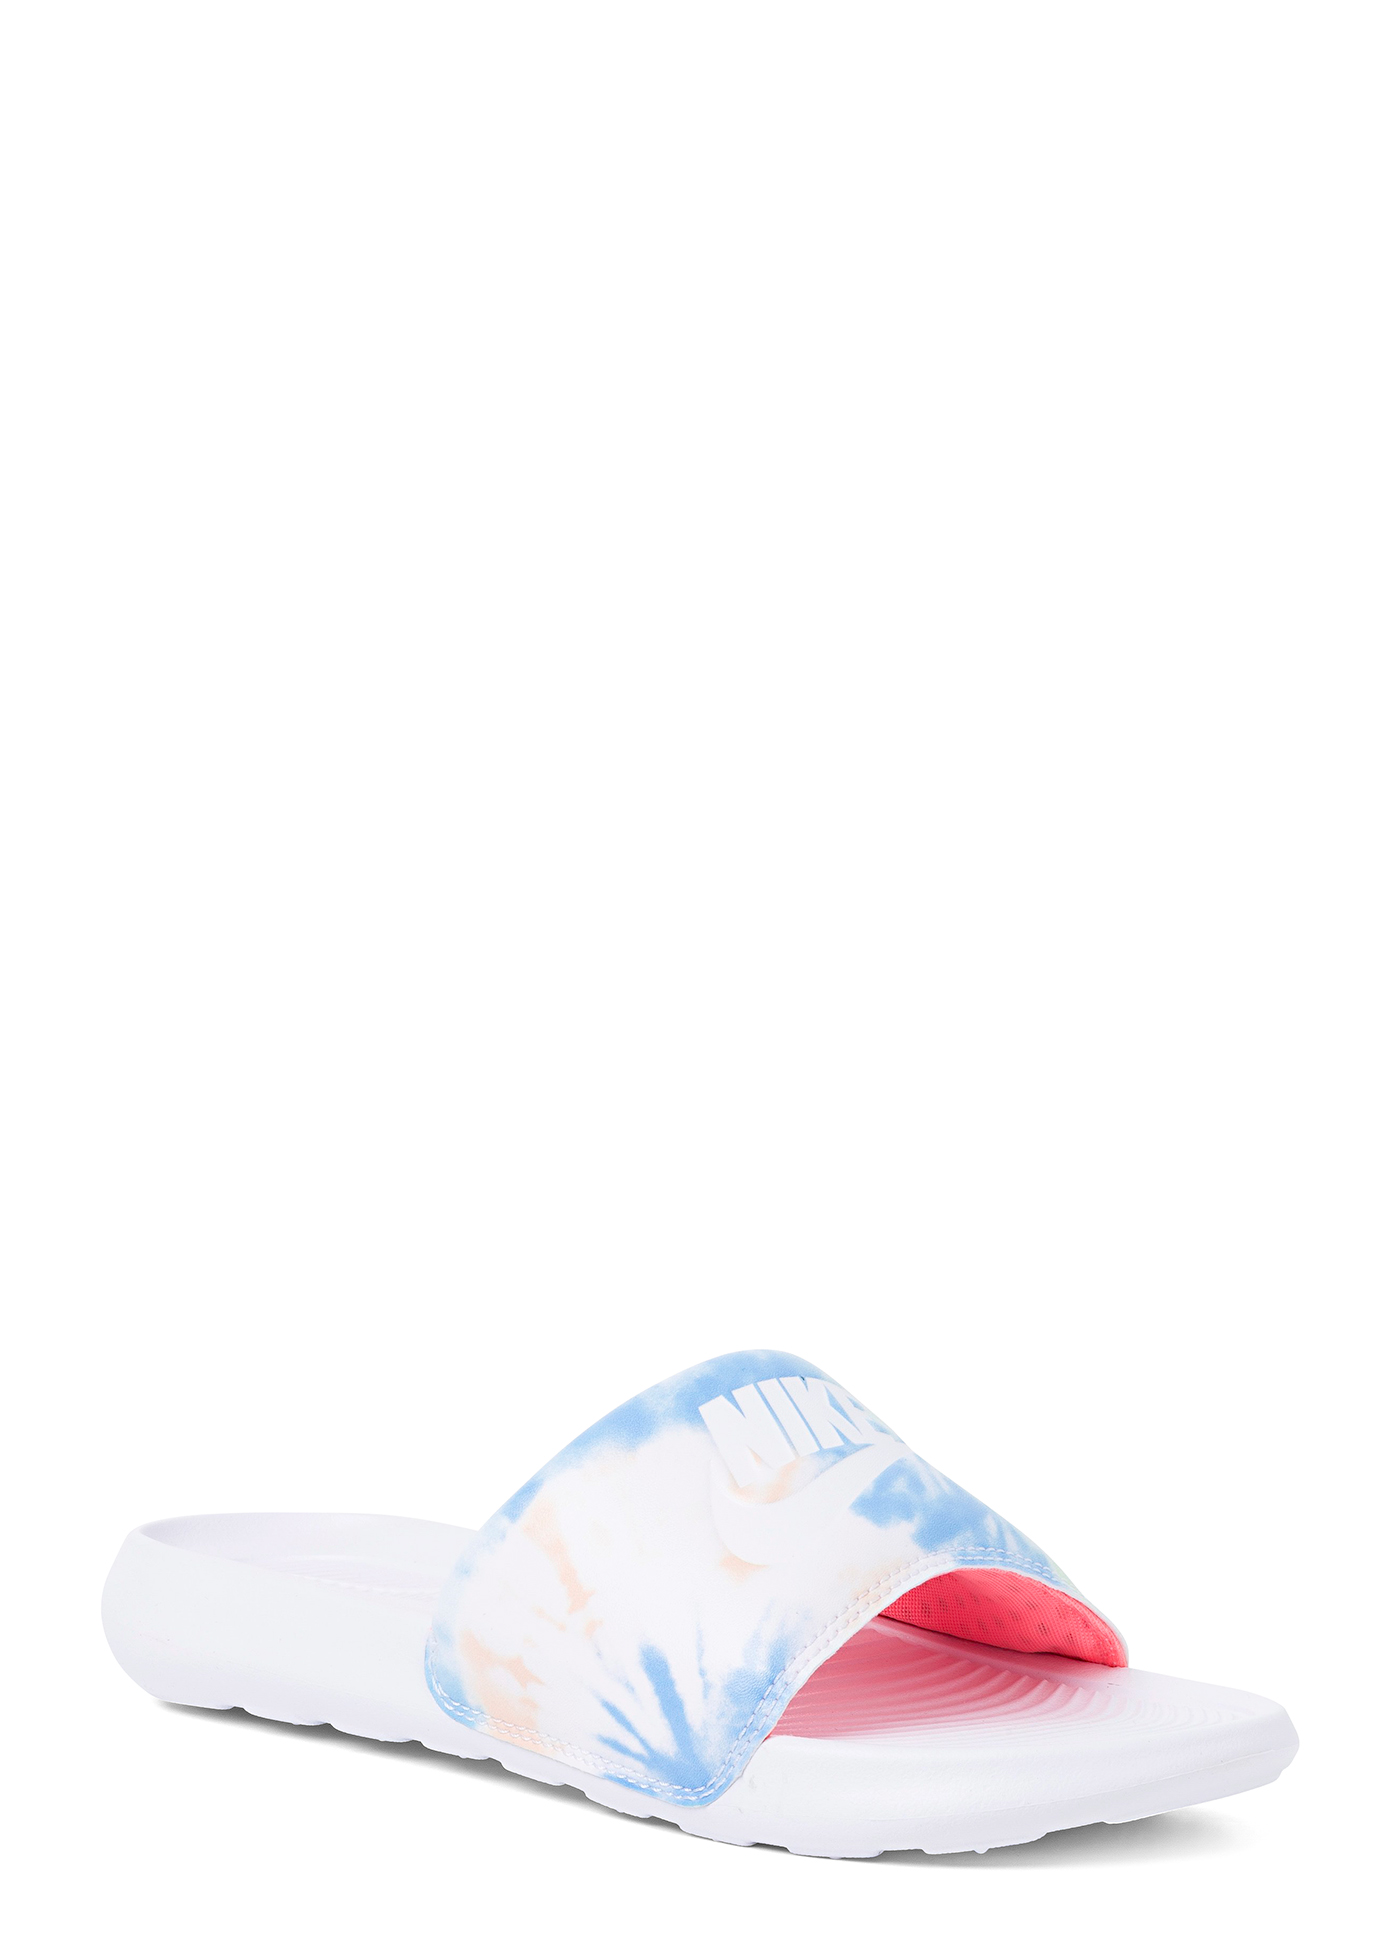 Nike Victori Print (Name Not Legal) image number 1